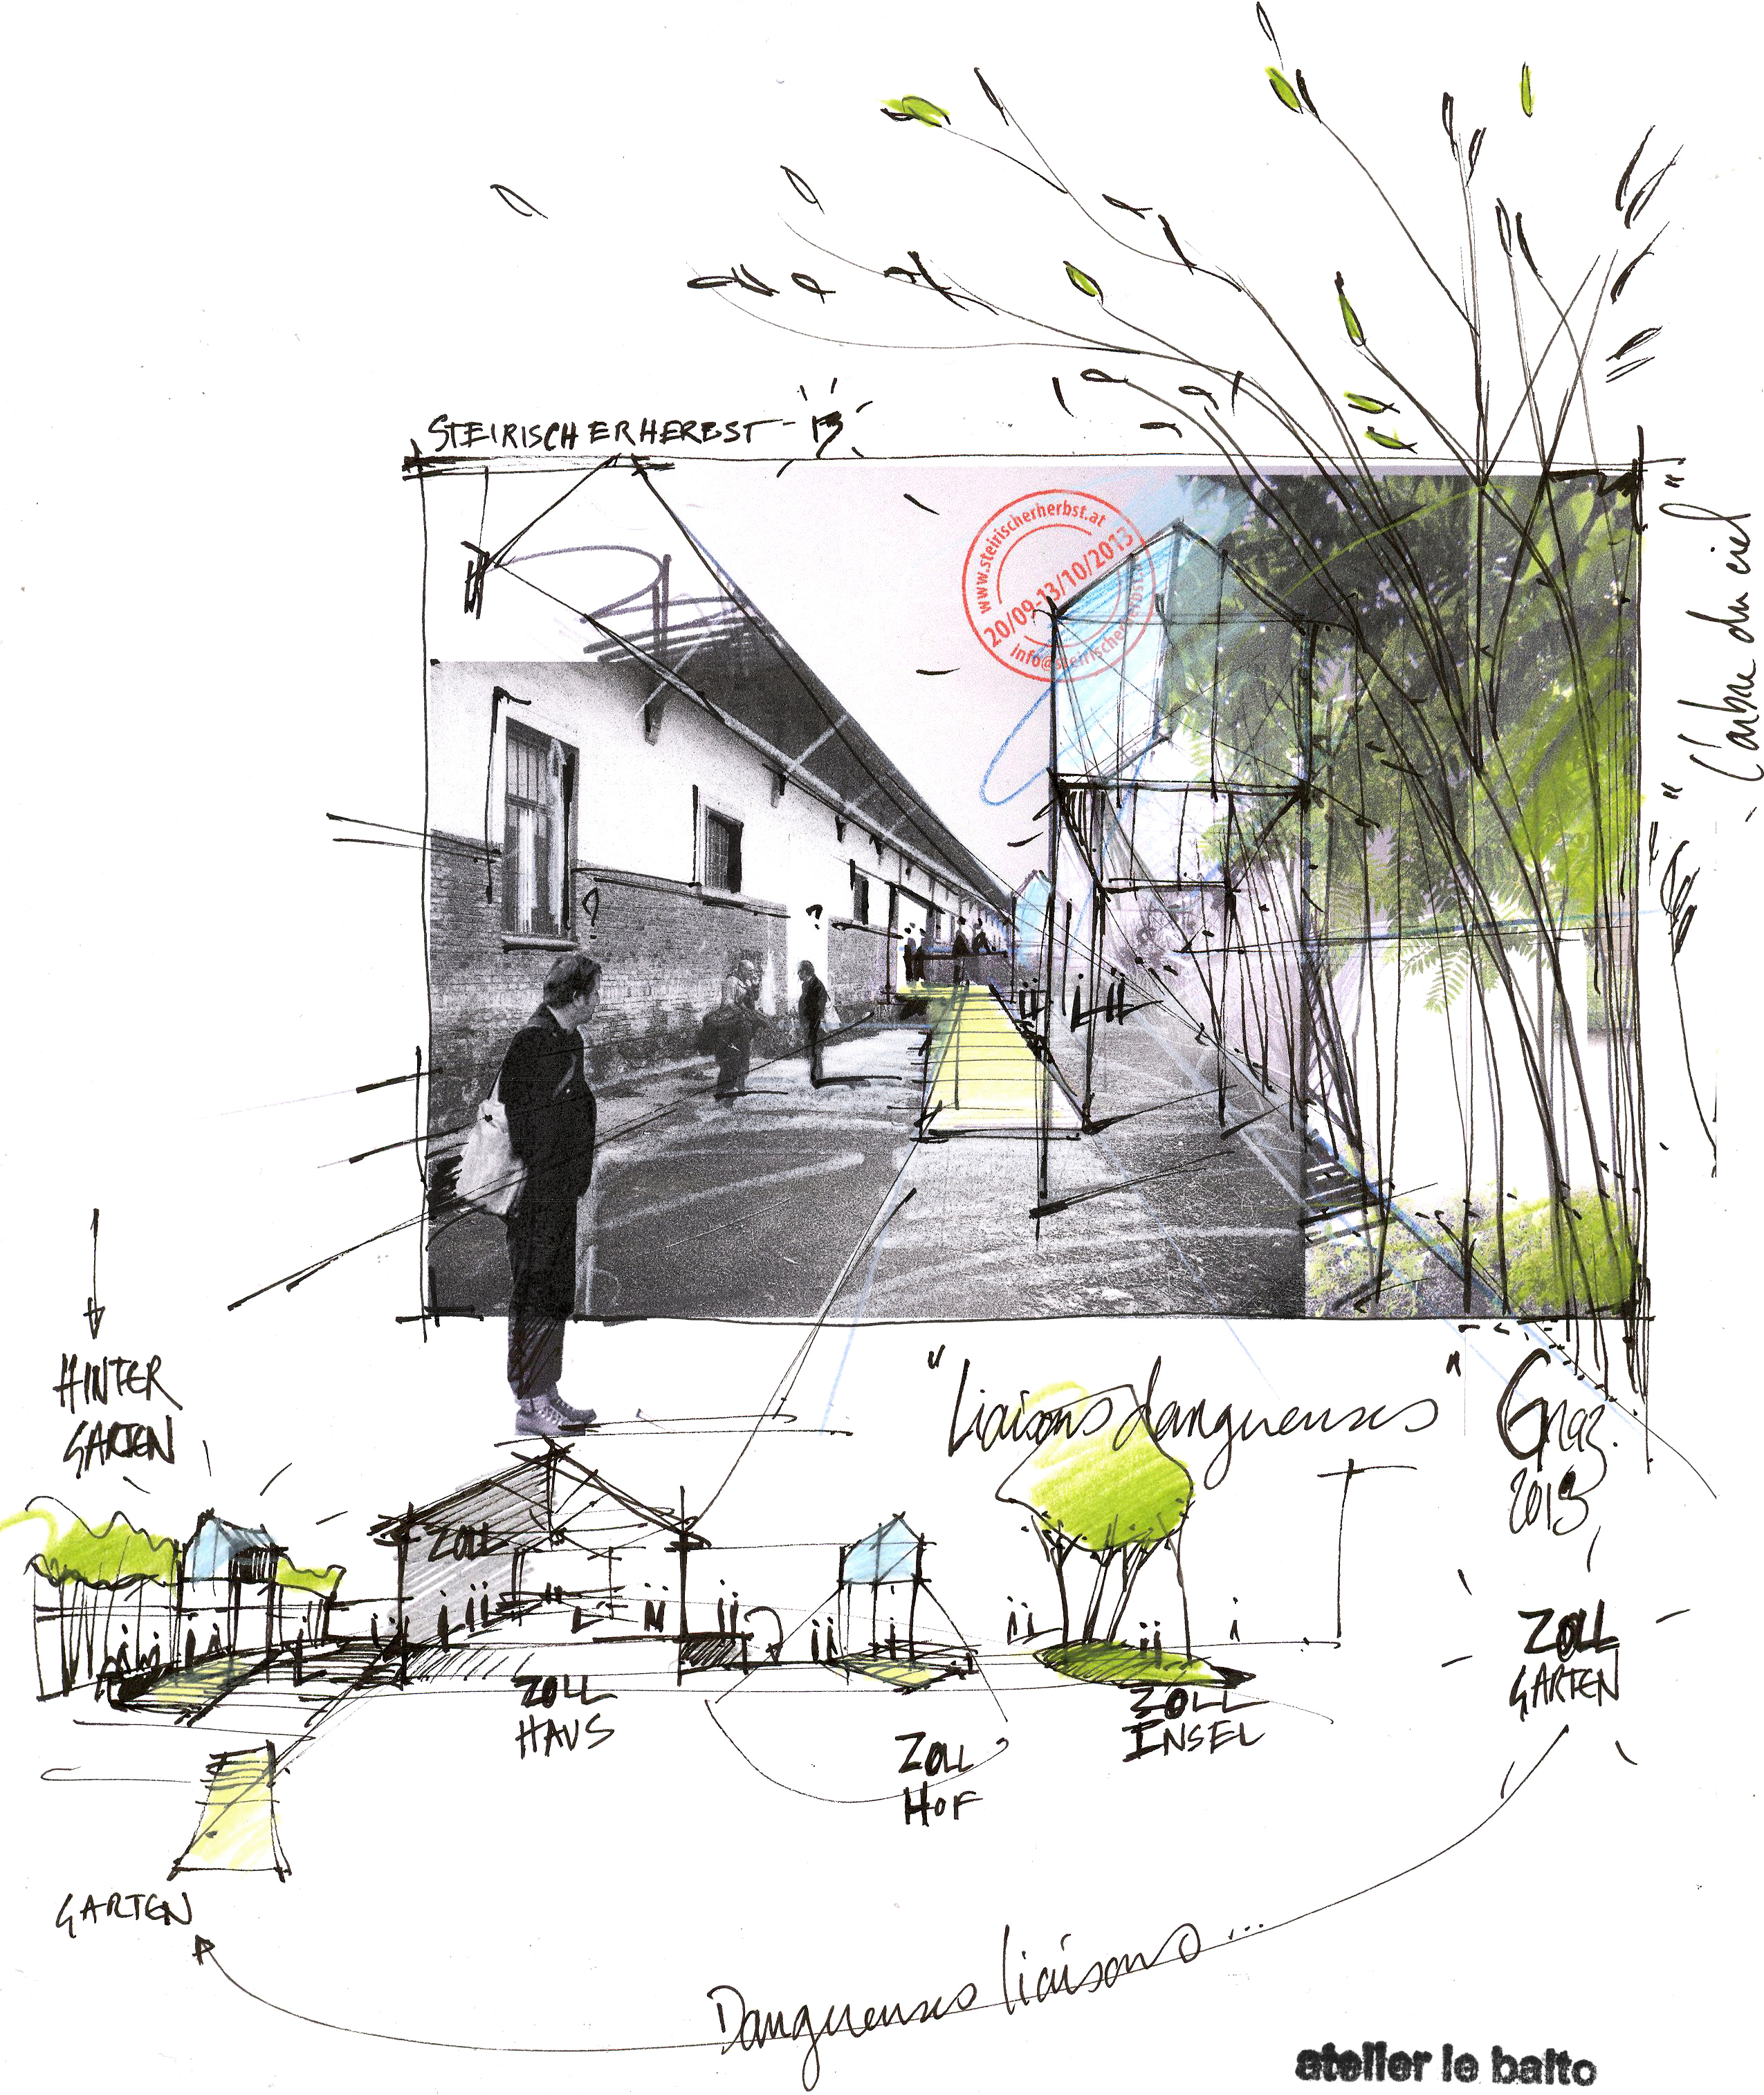 Konferenzen seite 2 for Learn landscape design